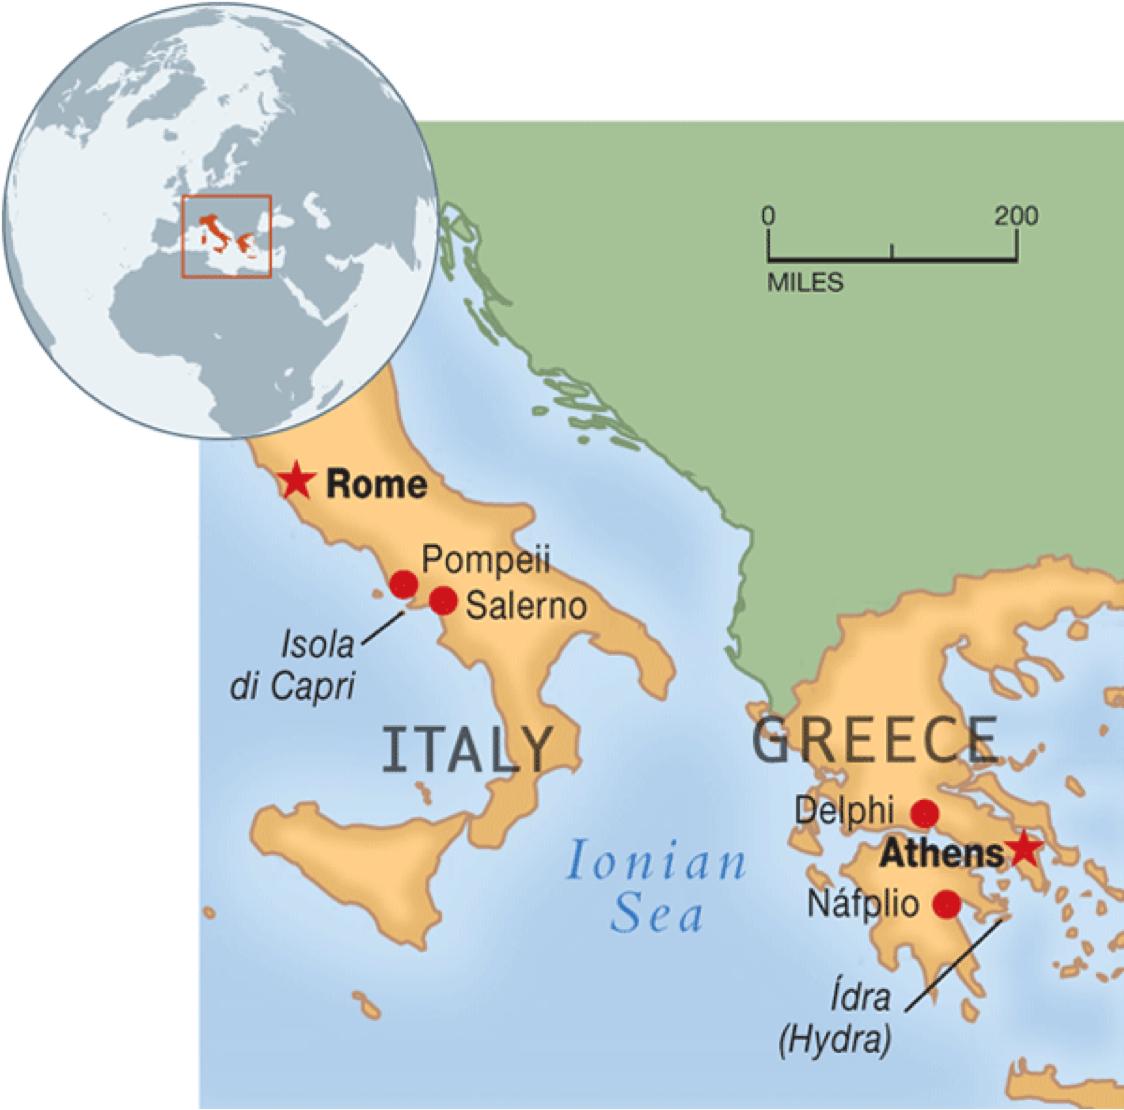 Untitled Haiku Deck By Melanie Caggiano - Greek and rome map